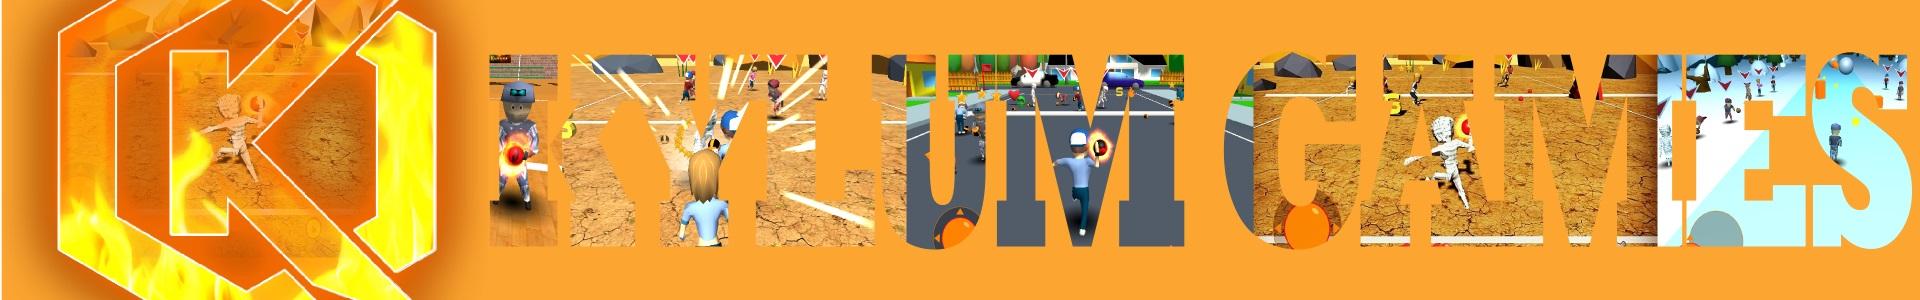 Kylum Games-Banner